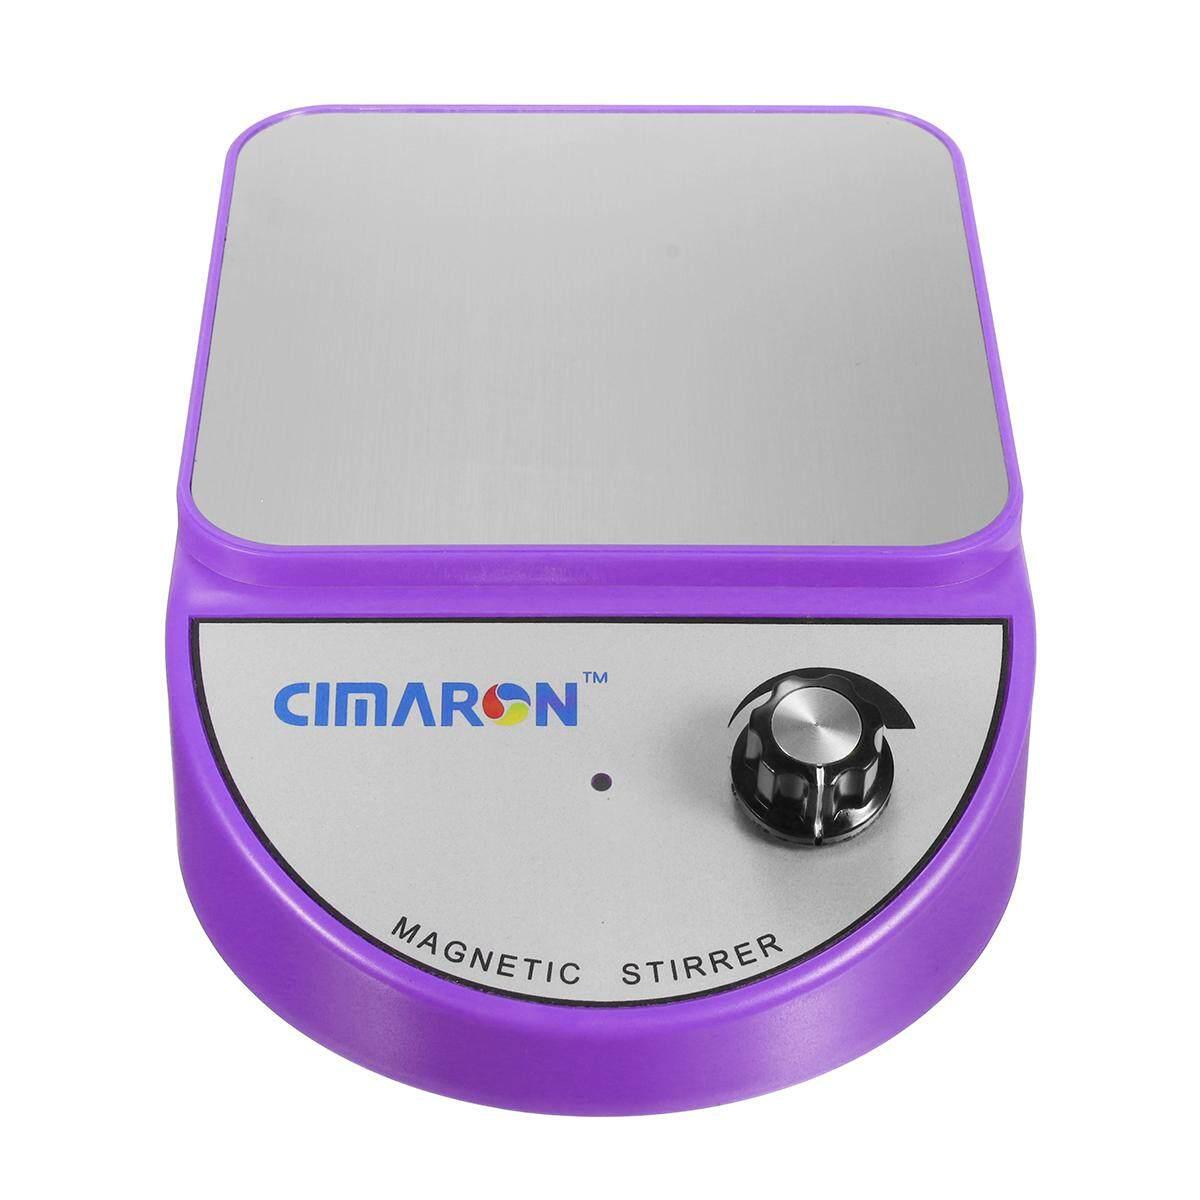 Magnetic Stirrer Laboratory Mixer CIMARON Blue Color 3500ml AC100 -240 Purple